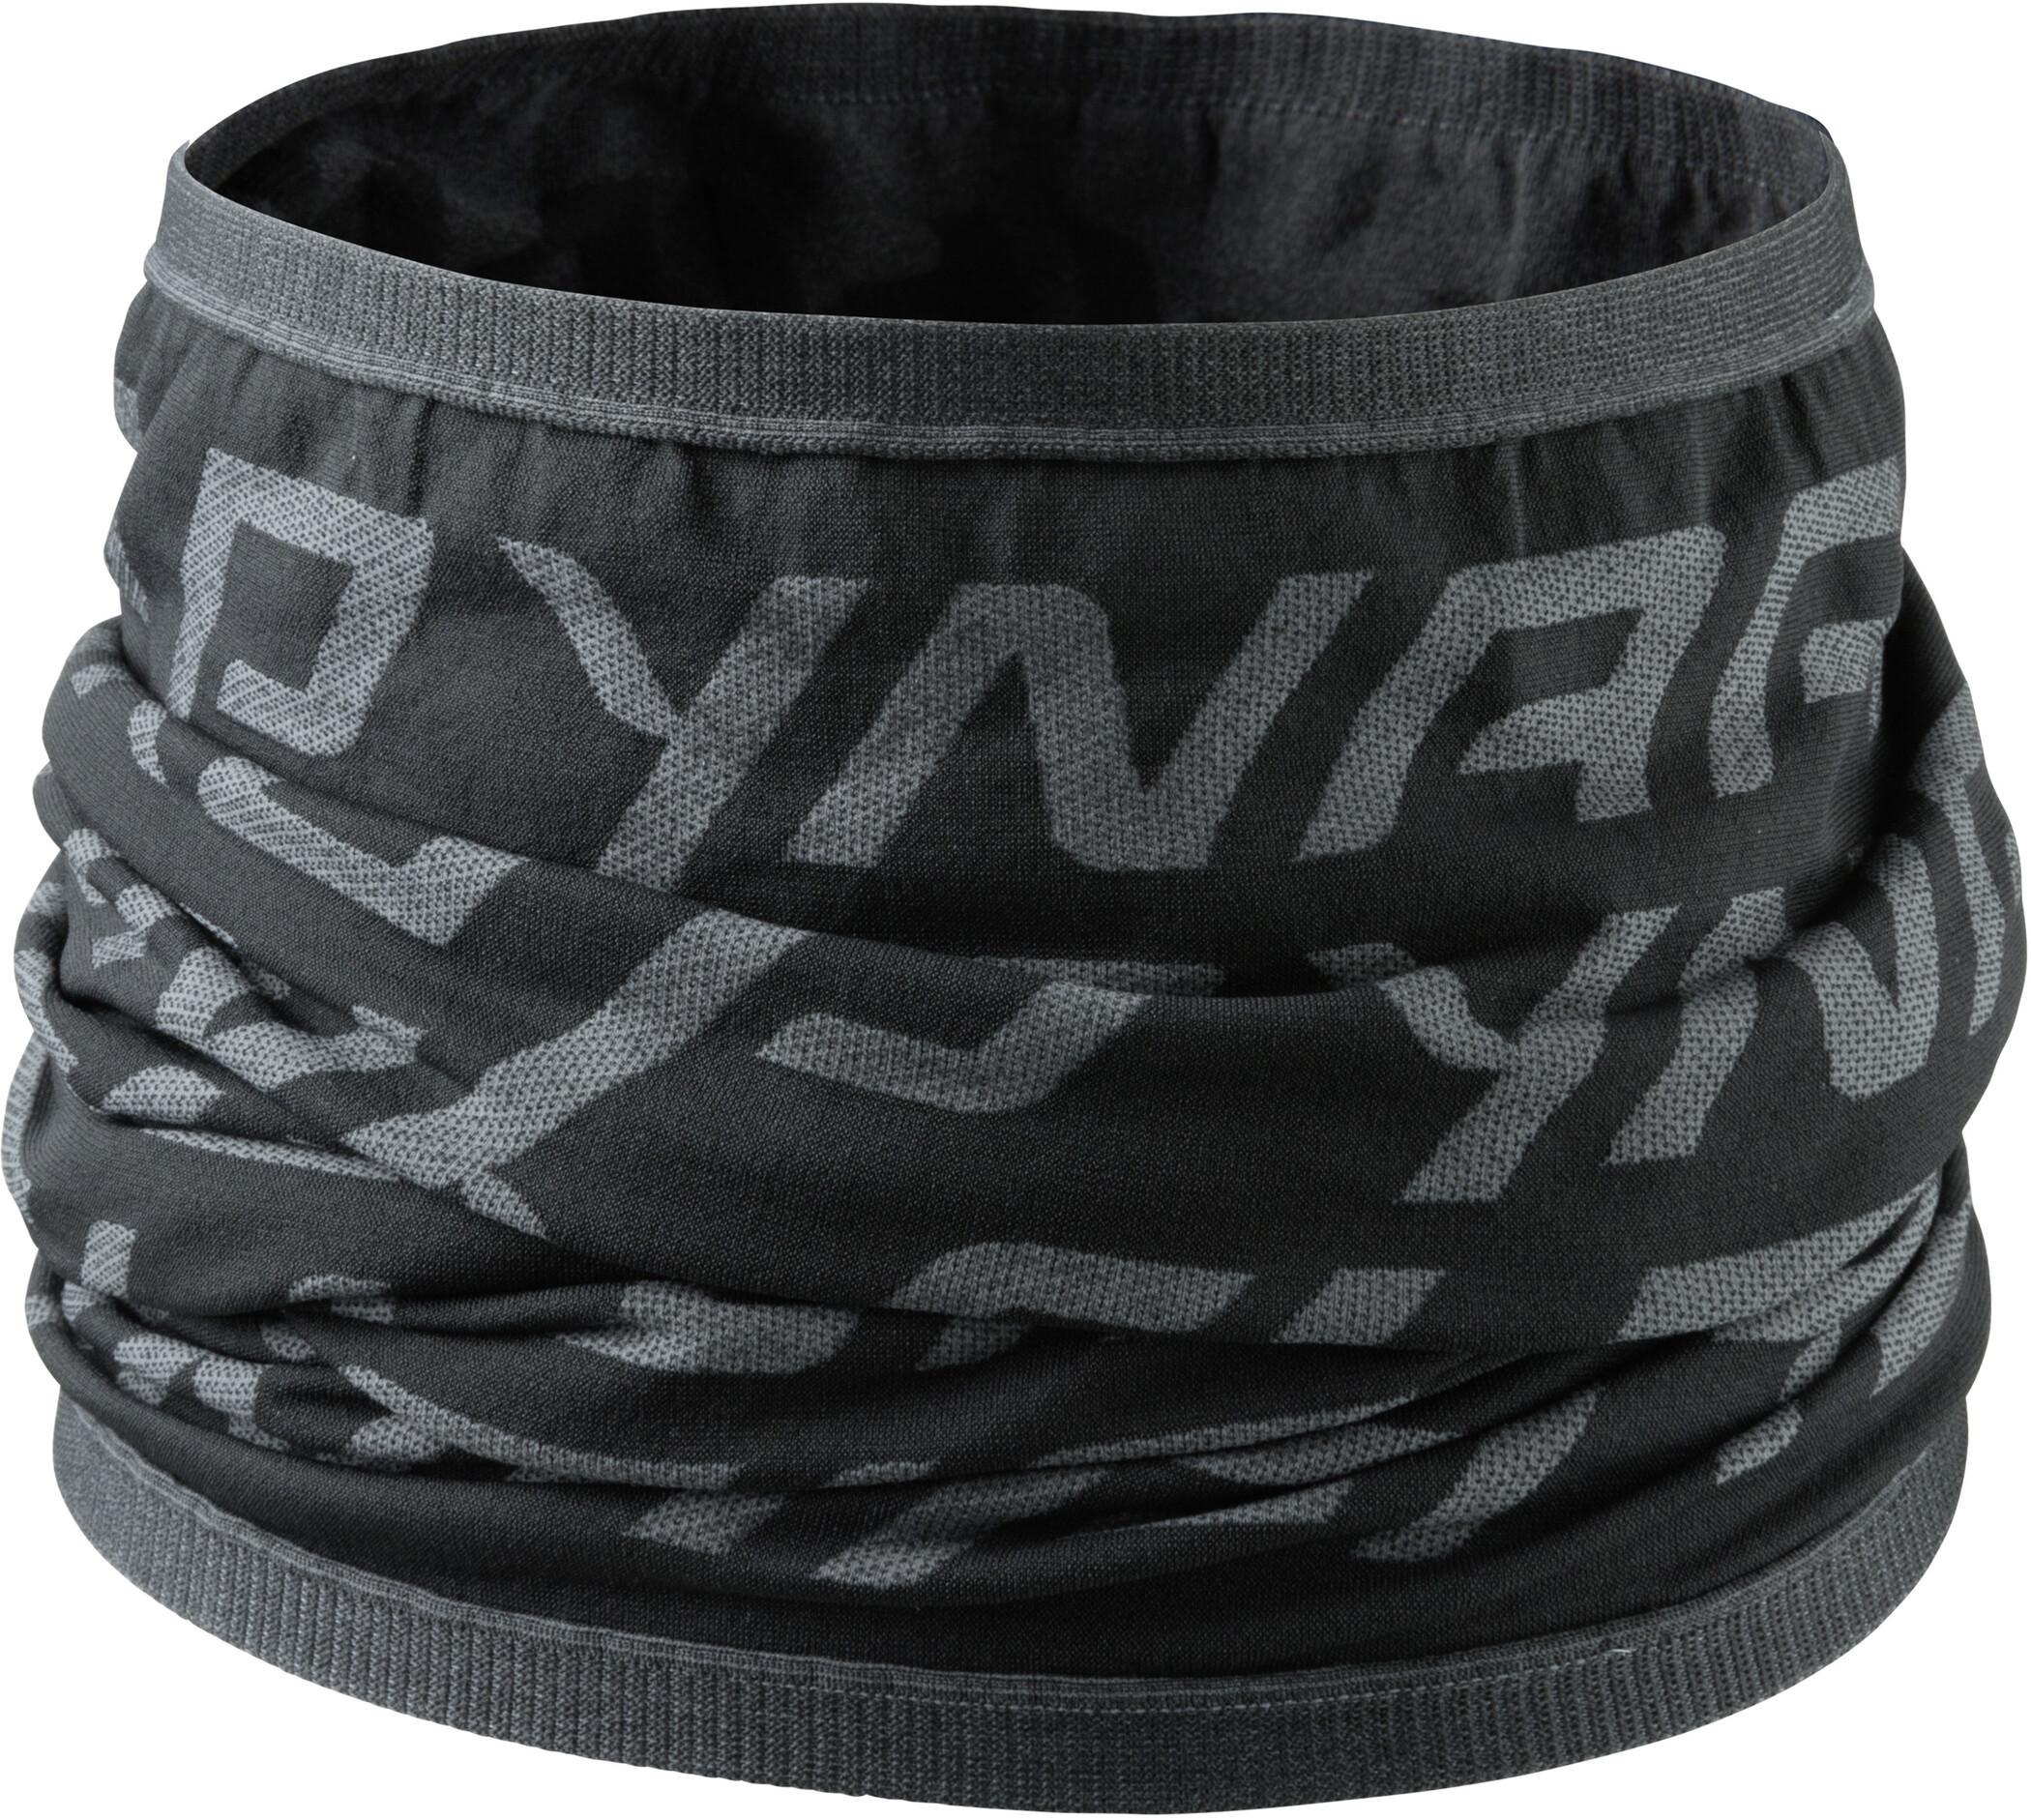 Dynafit Performance Dryarn Halsedisse, asphalt (2020) | Hovedbeklædning